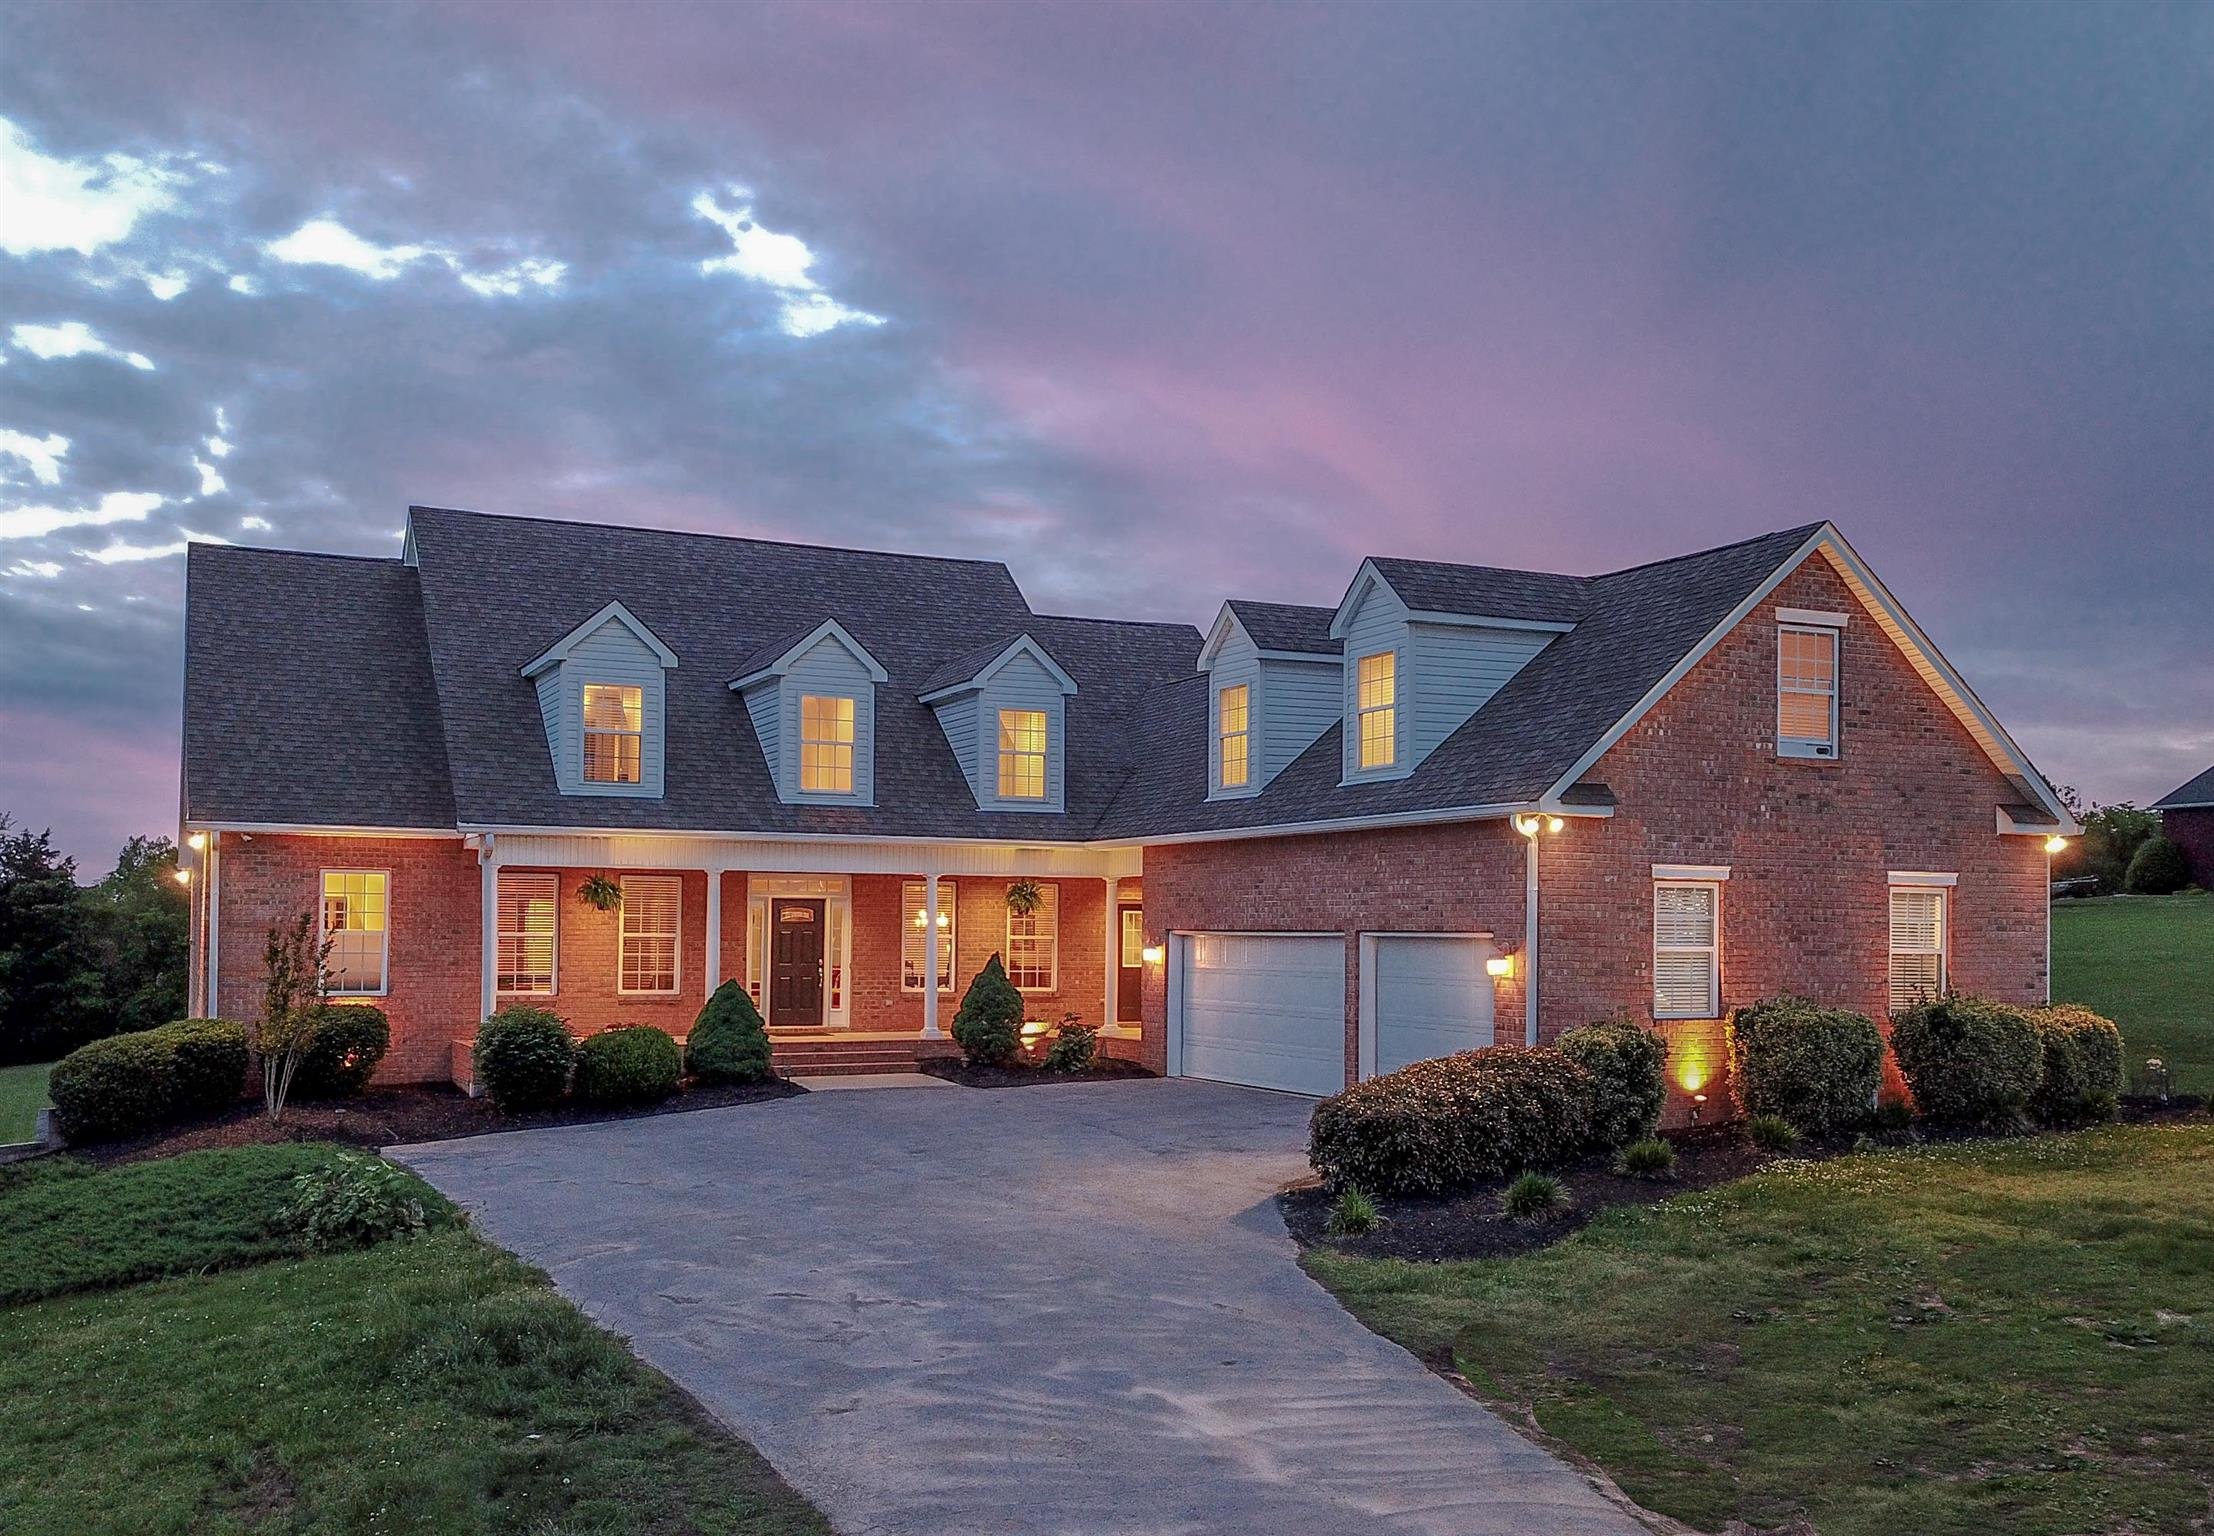 370 Holt Rd, Lebanon, TN 37087 - Lebanon, TN real estate listing